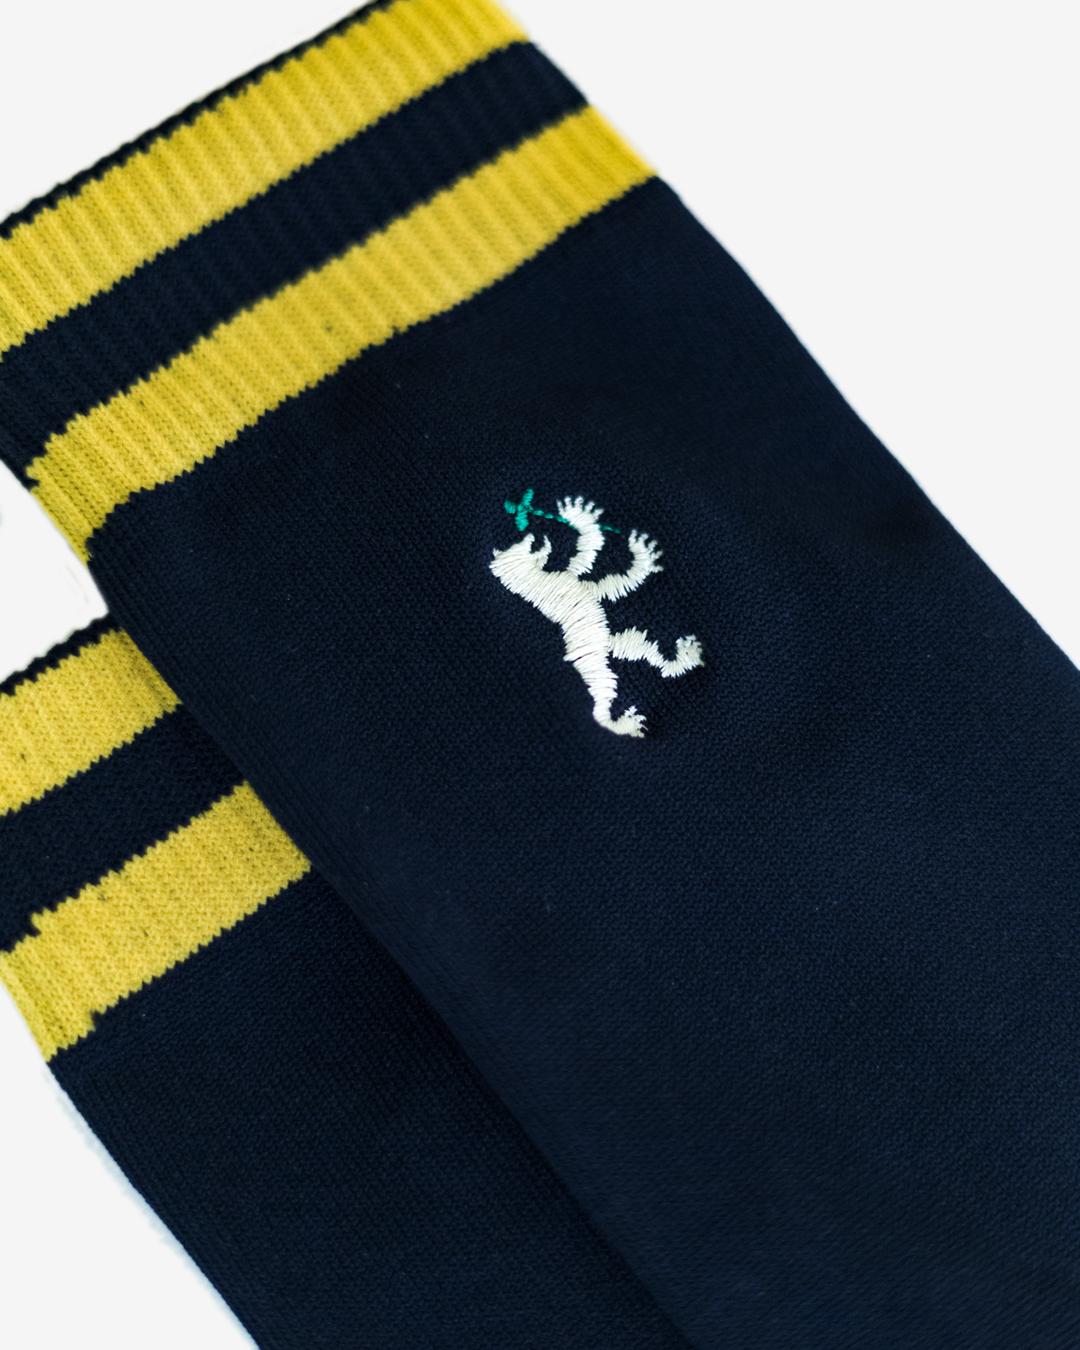 Classic Navy Socks